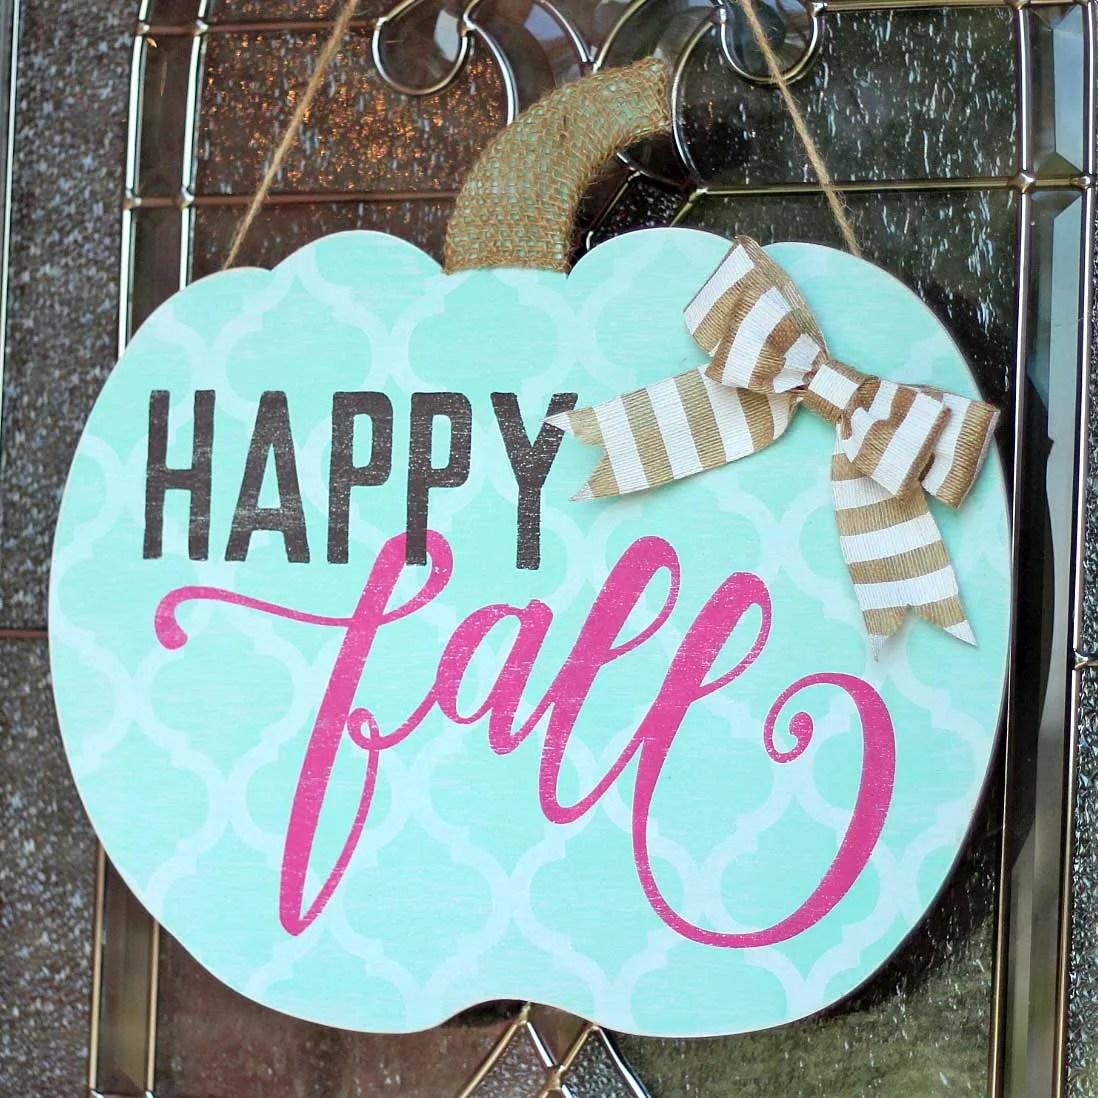 abdfccf0534c Shabby Chic Happy Fall Pumpkin Door Hanger